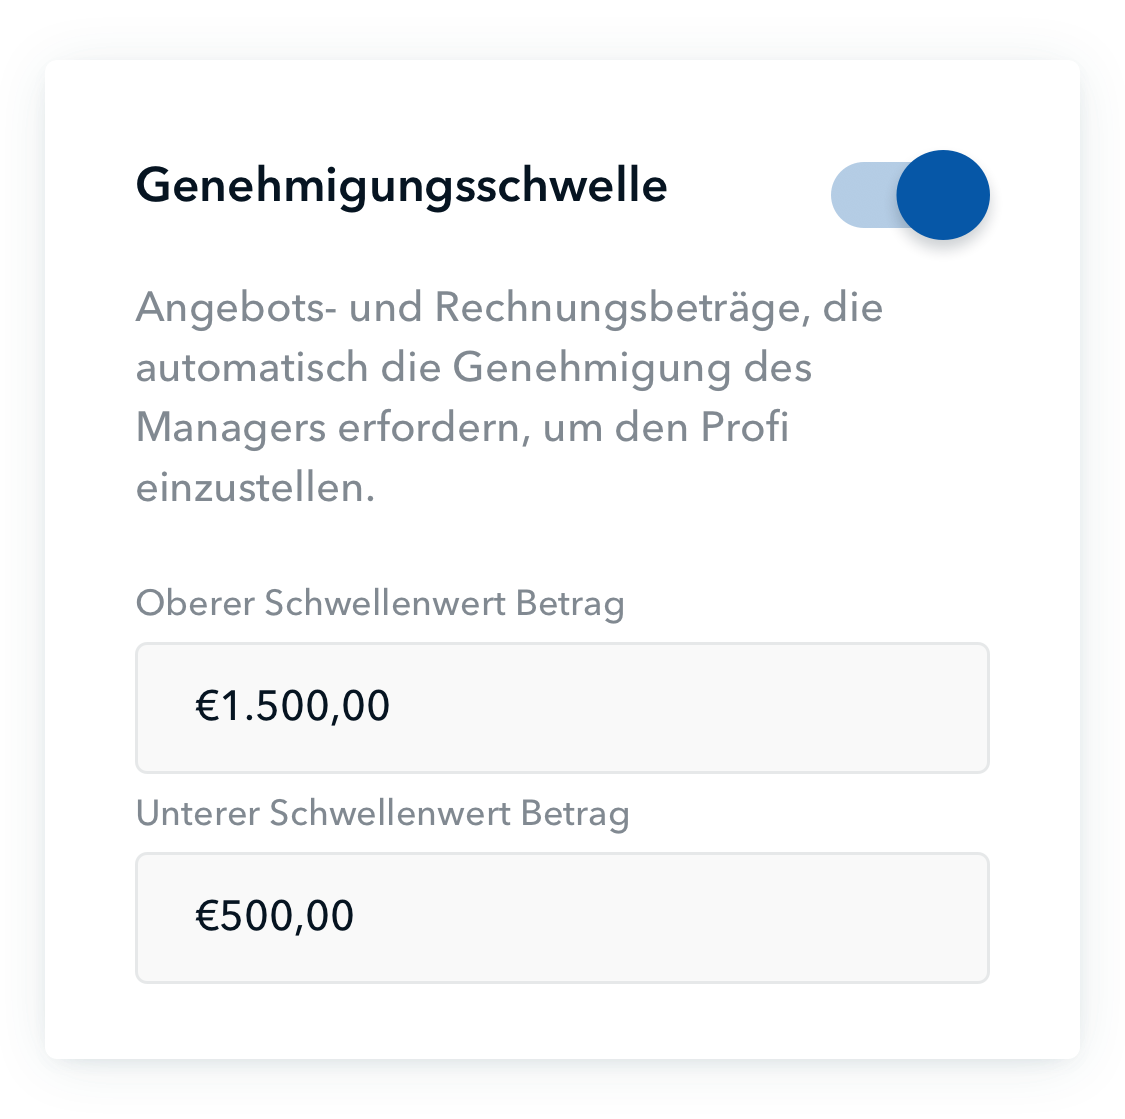 DE_sml_prod_core_finance_mgmt_05